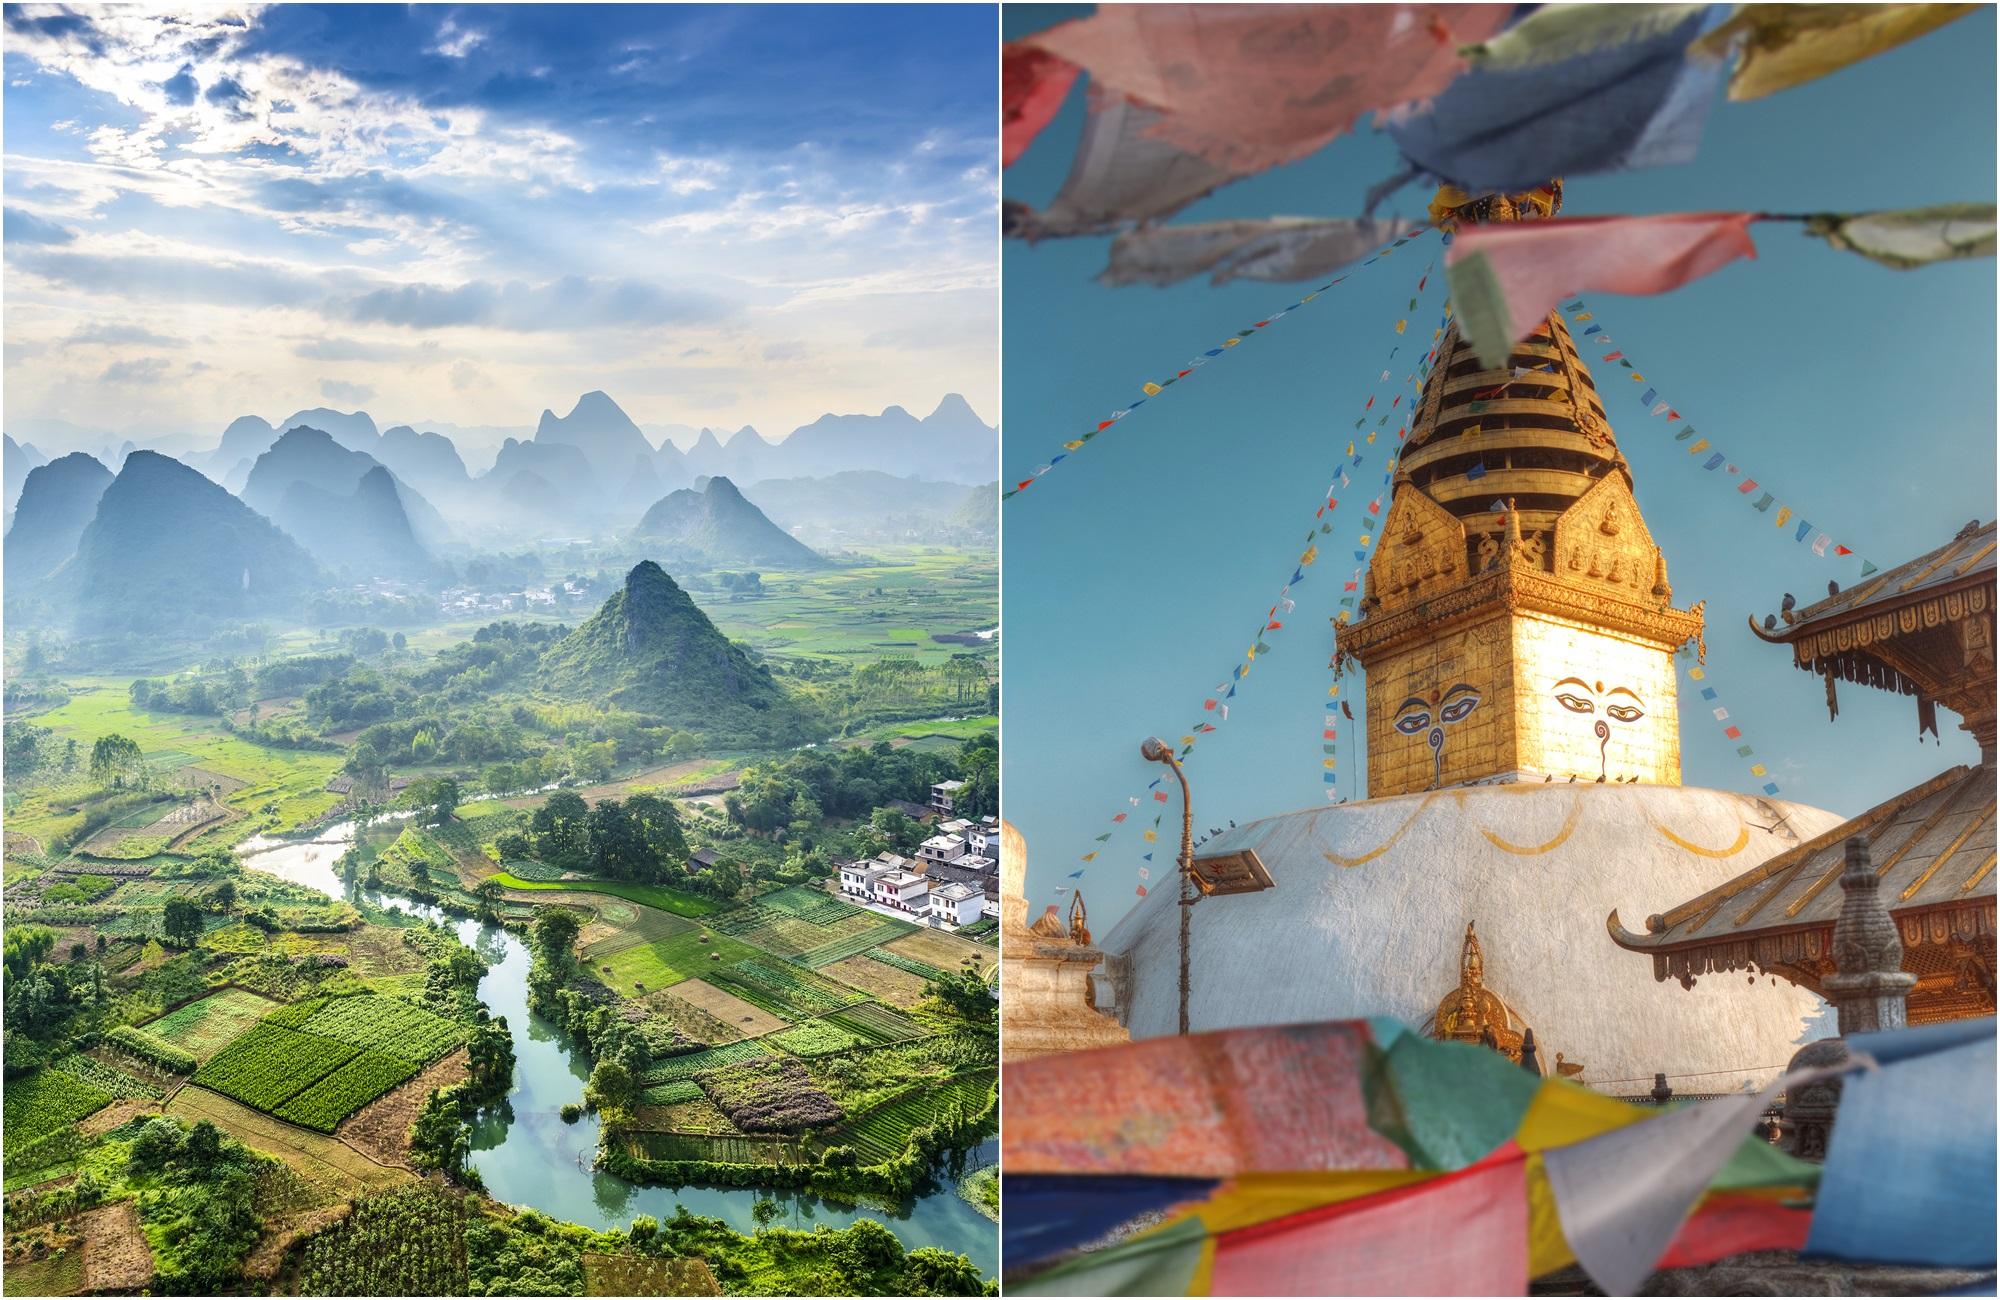 Voyage Chine - Népal - Guilin Swayambhunath - Amplitudes